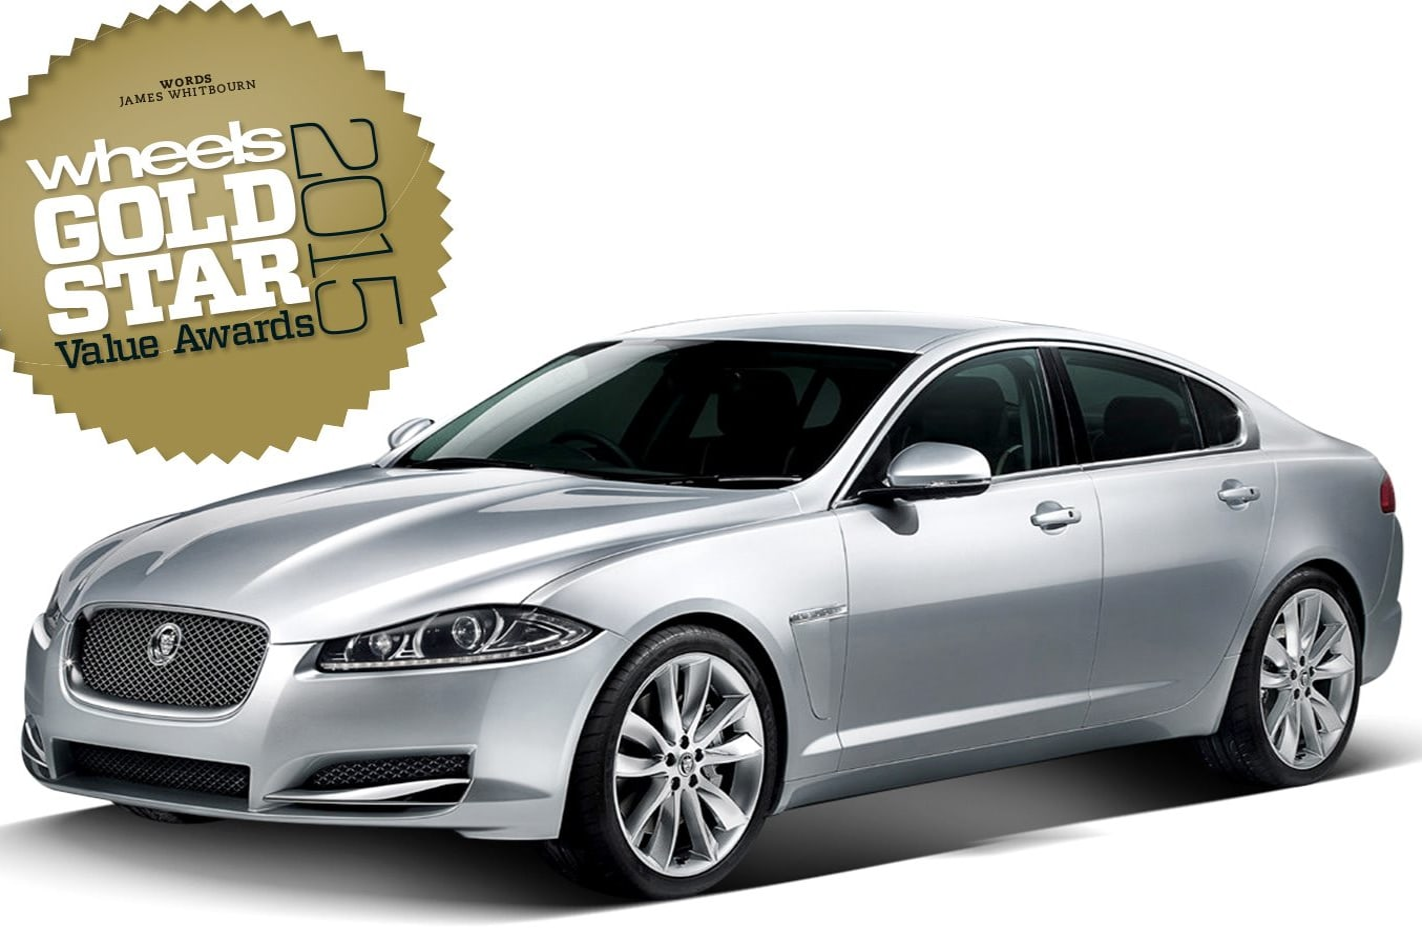 Premium Large Cars: Gold Star Value Awards 2015